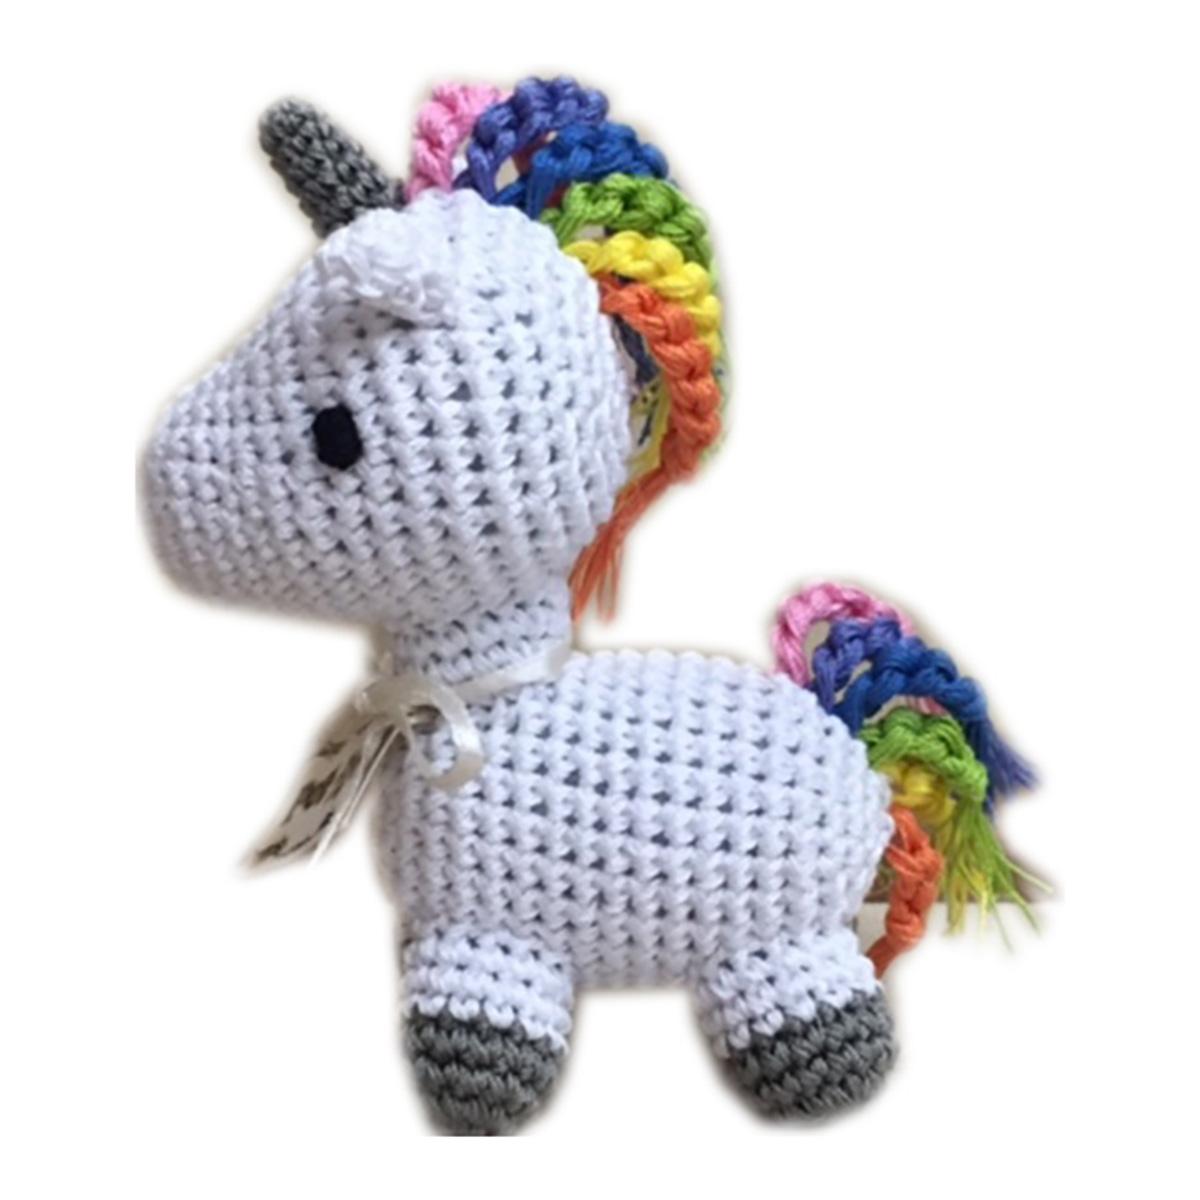 Knitting Pattern For Unicorn Toy : Knit Knacks Mystic the Magic Unicorn Organic Dog Toy ...